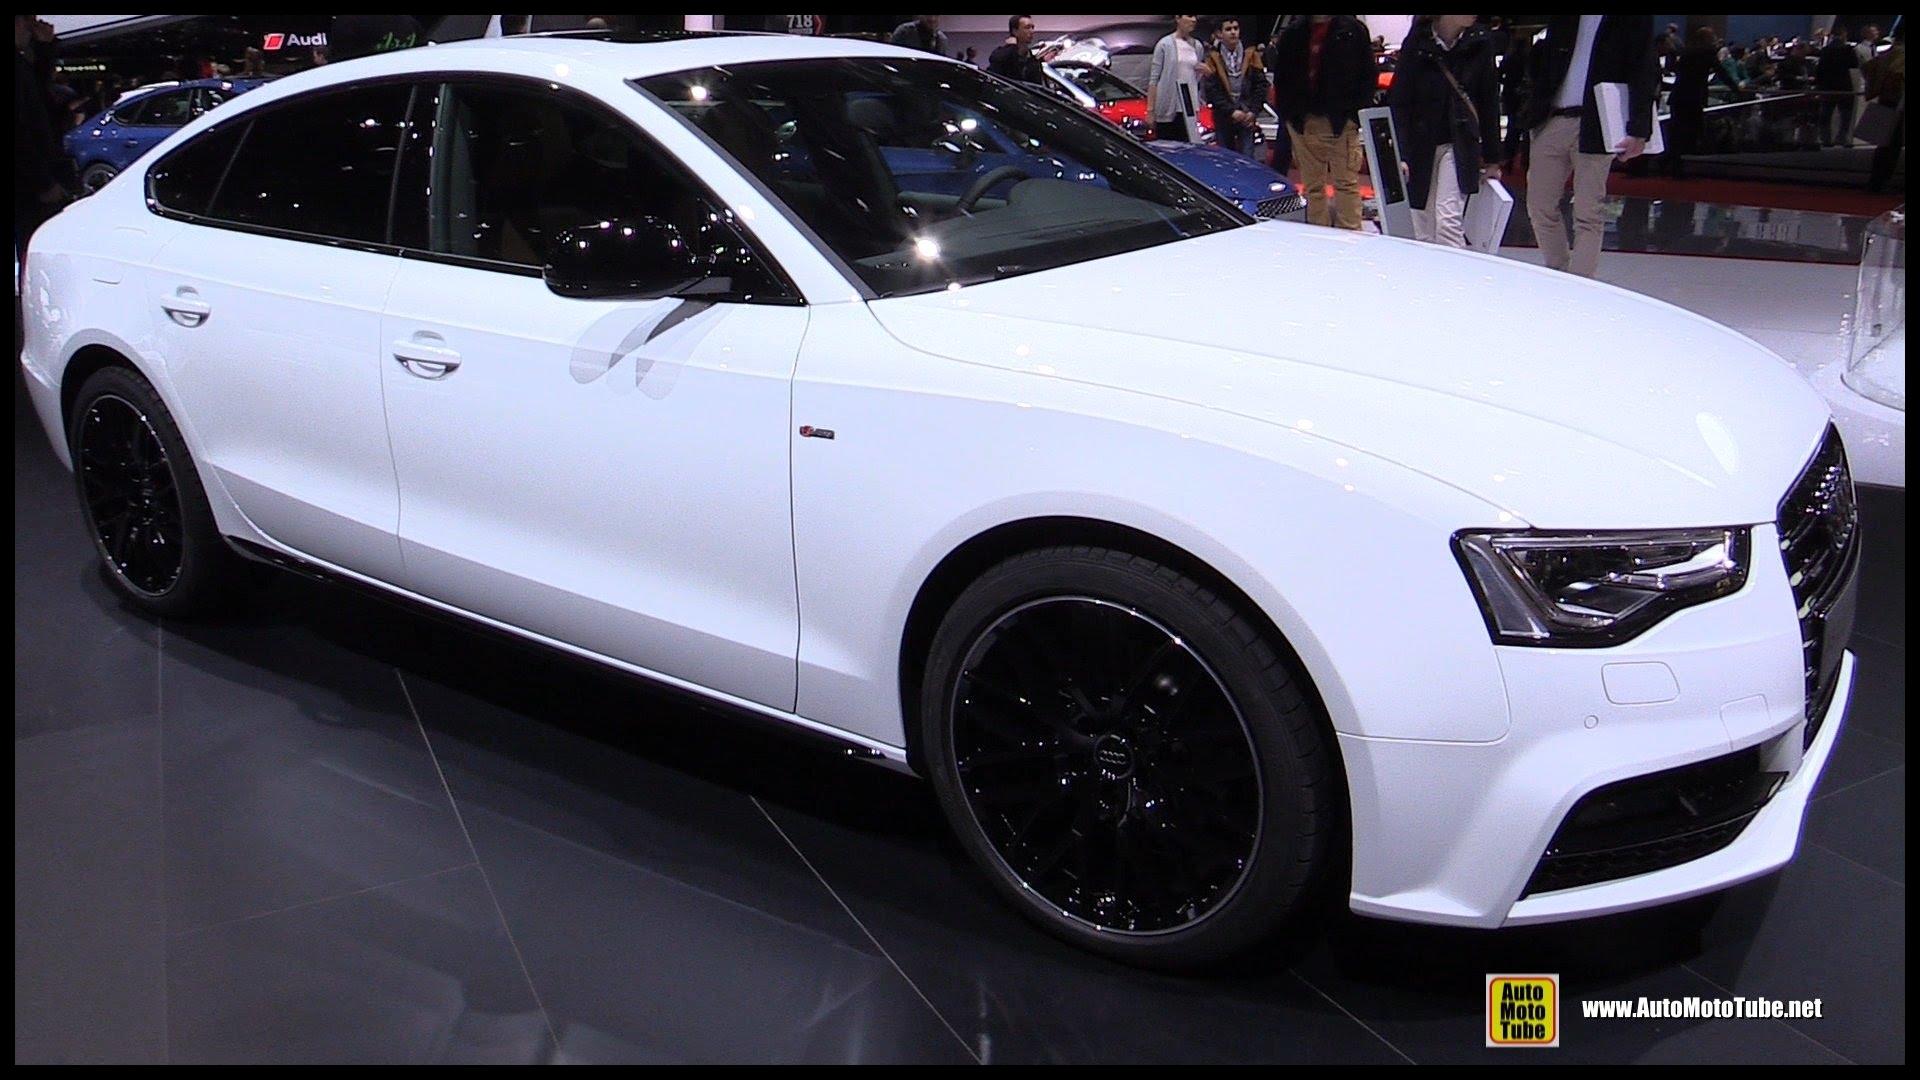 2016 Audi A5 Sportback 2 0 TDI Quattro Exterior and Interior Walkaround 2016 Geneva Motor Show